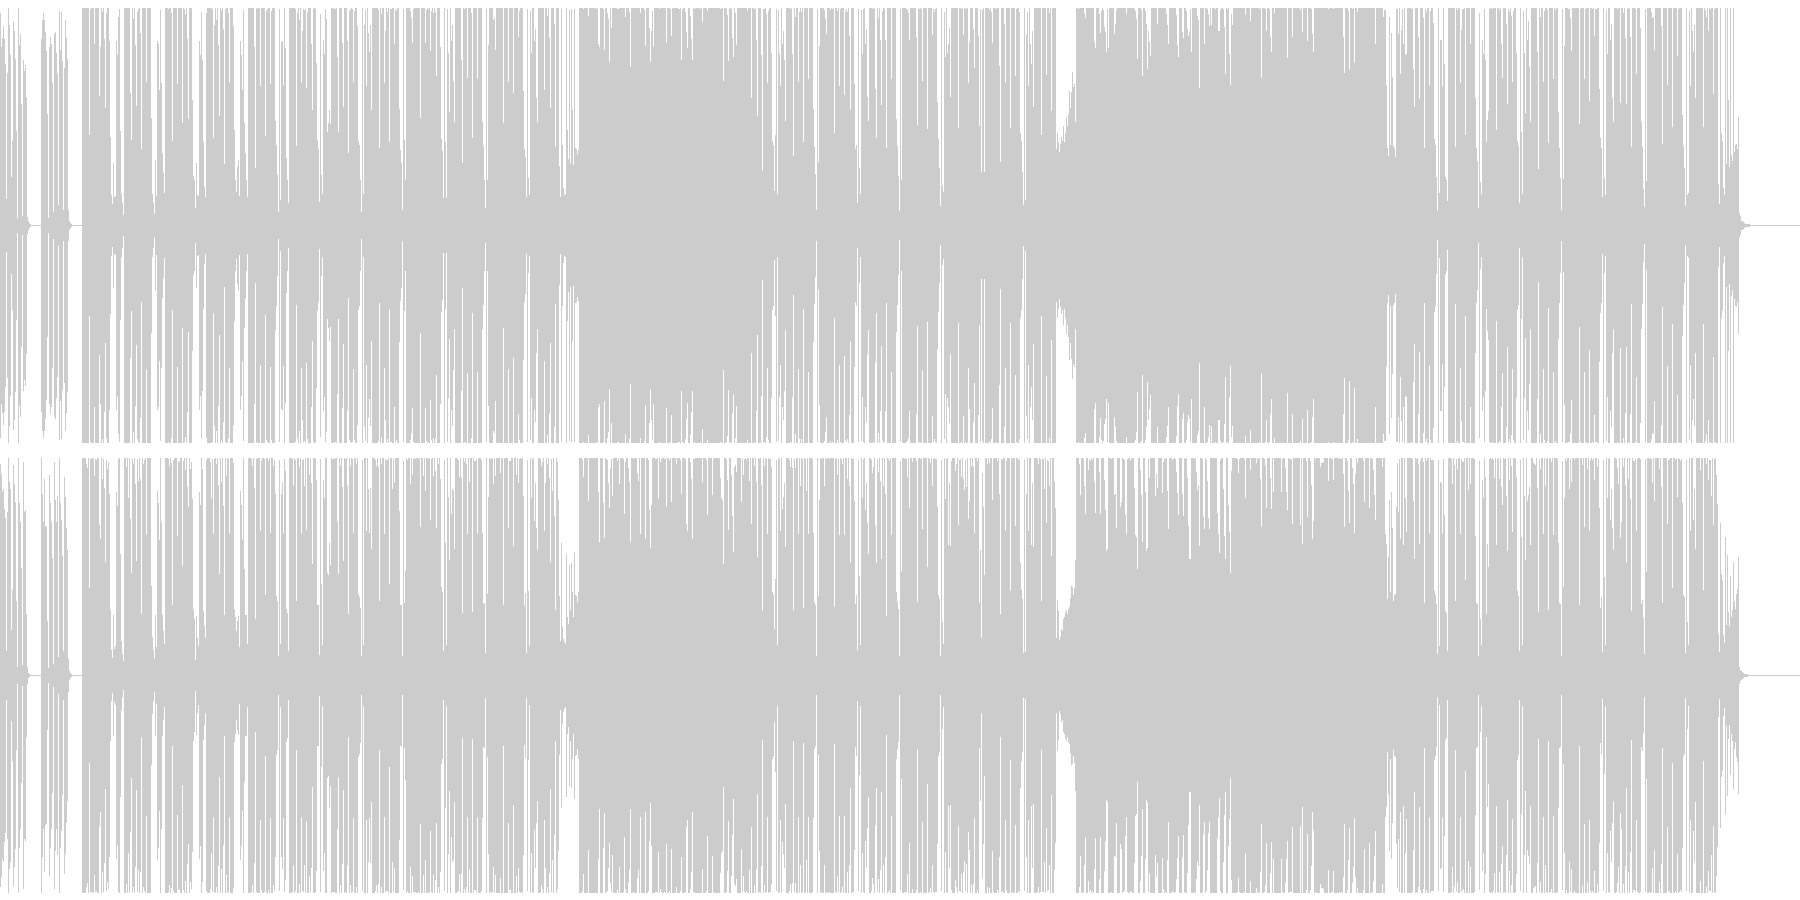 CM・VP・ゲーム等 軽快なギターポップの未再生の波形